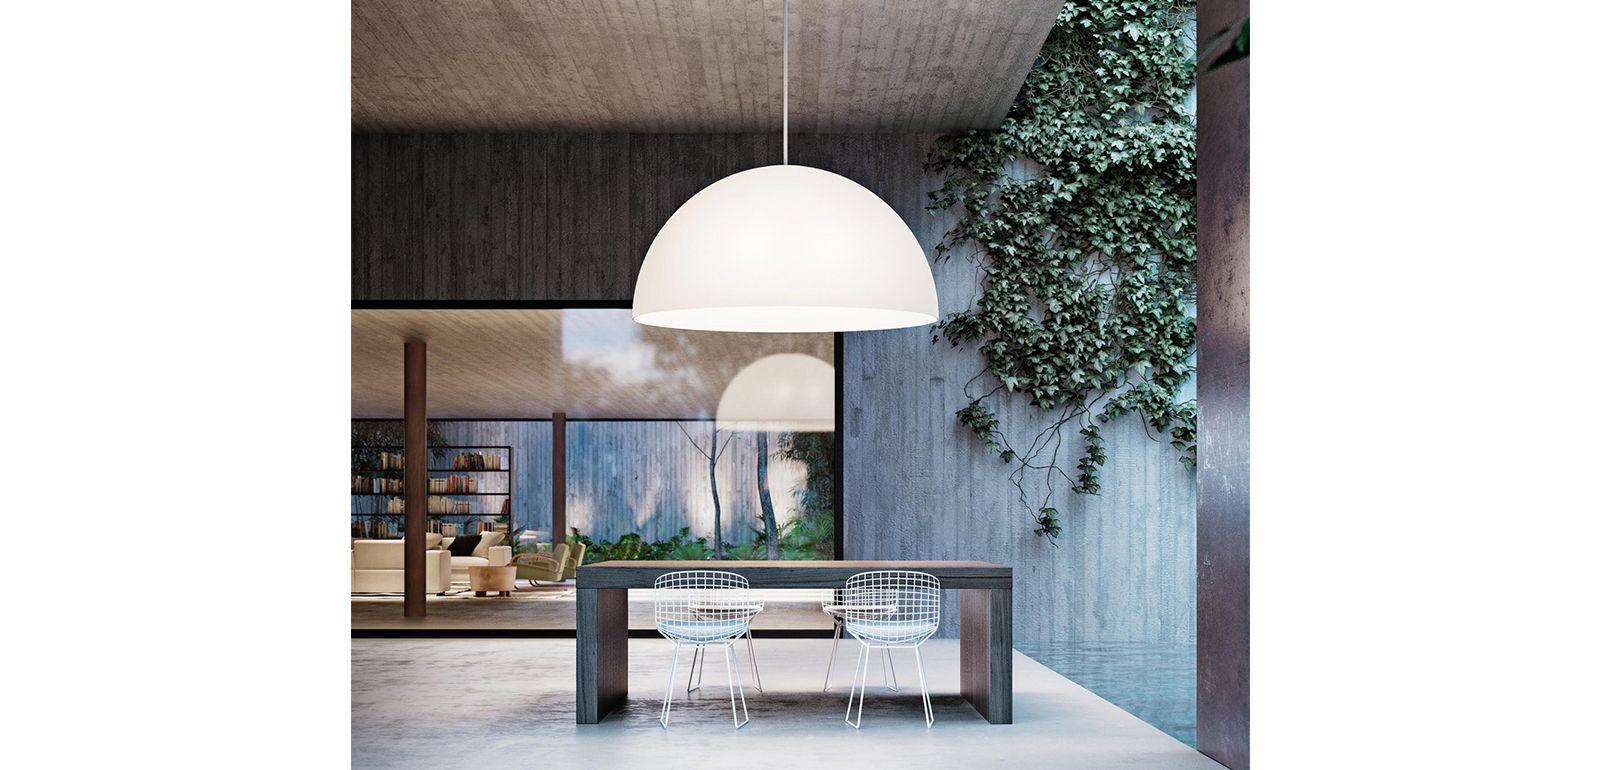 mobilier design outdoor exterieur am nagement meuble de jardin silvera. Black Bedroom Furniture Sets. Home Design Ideas